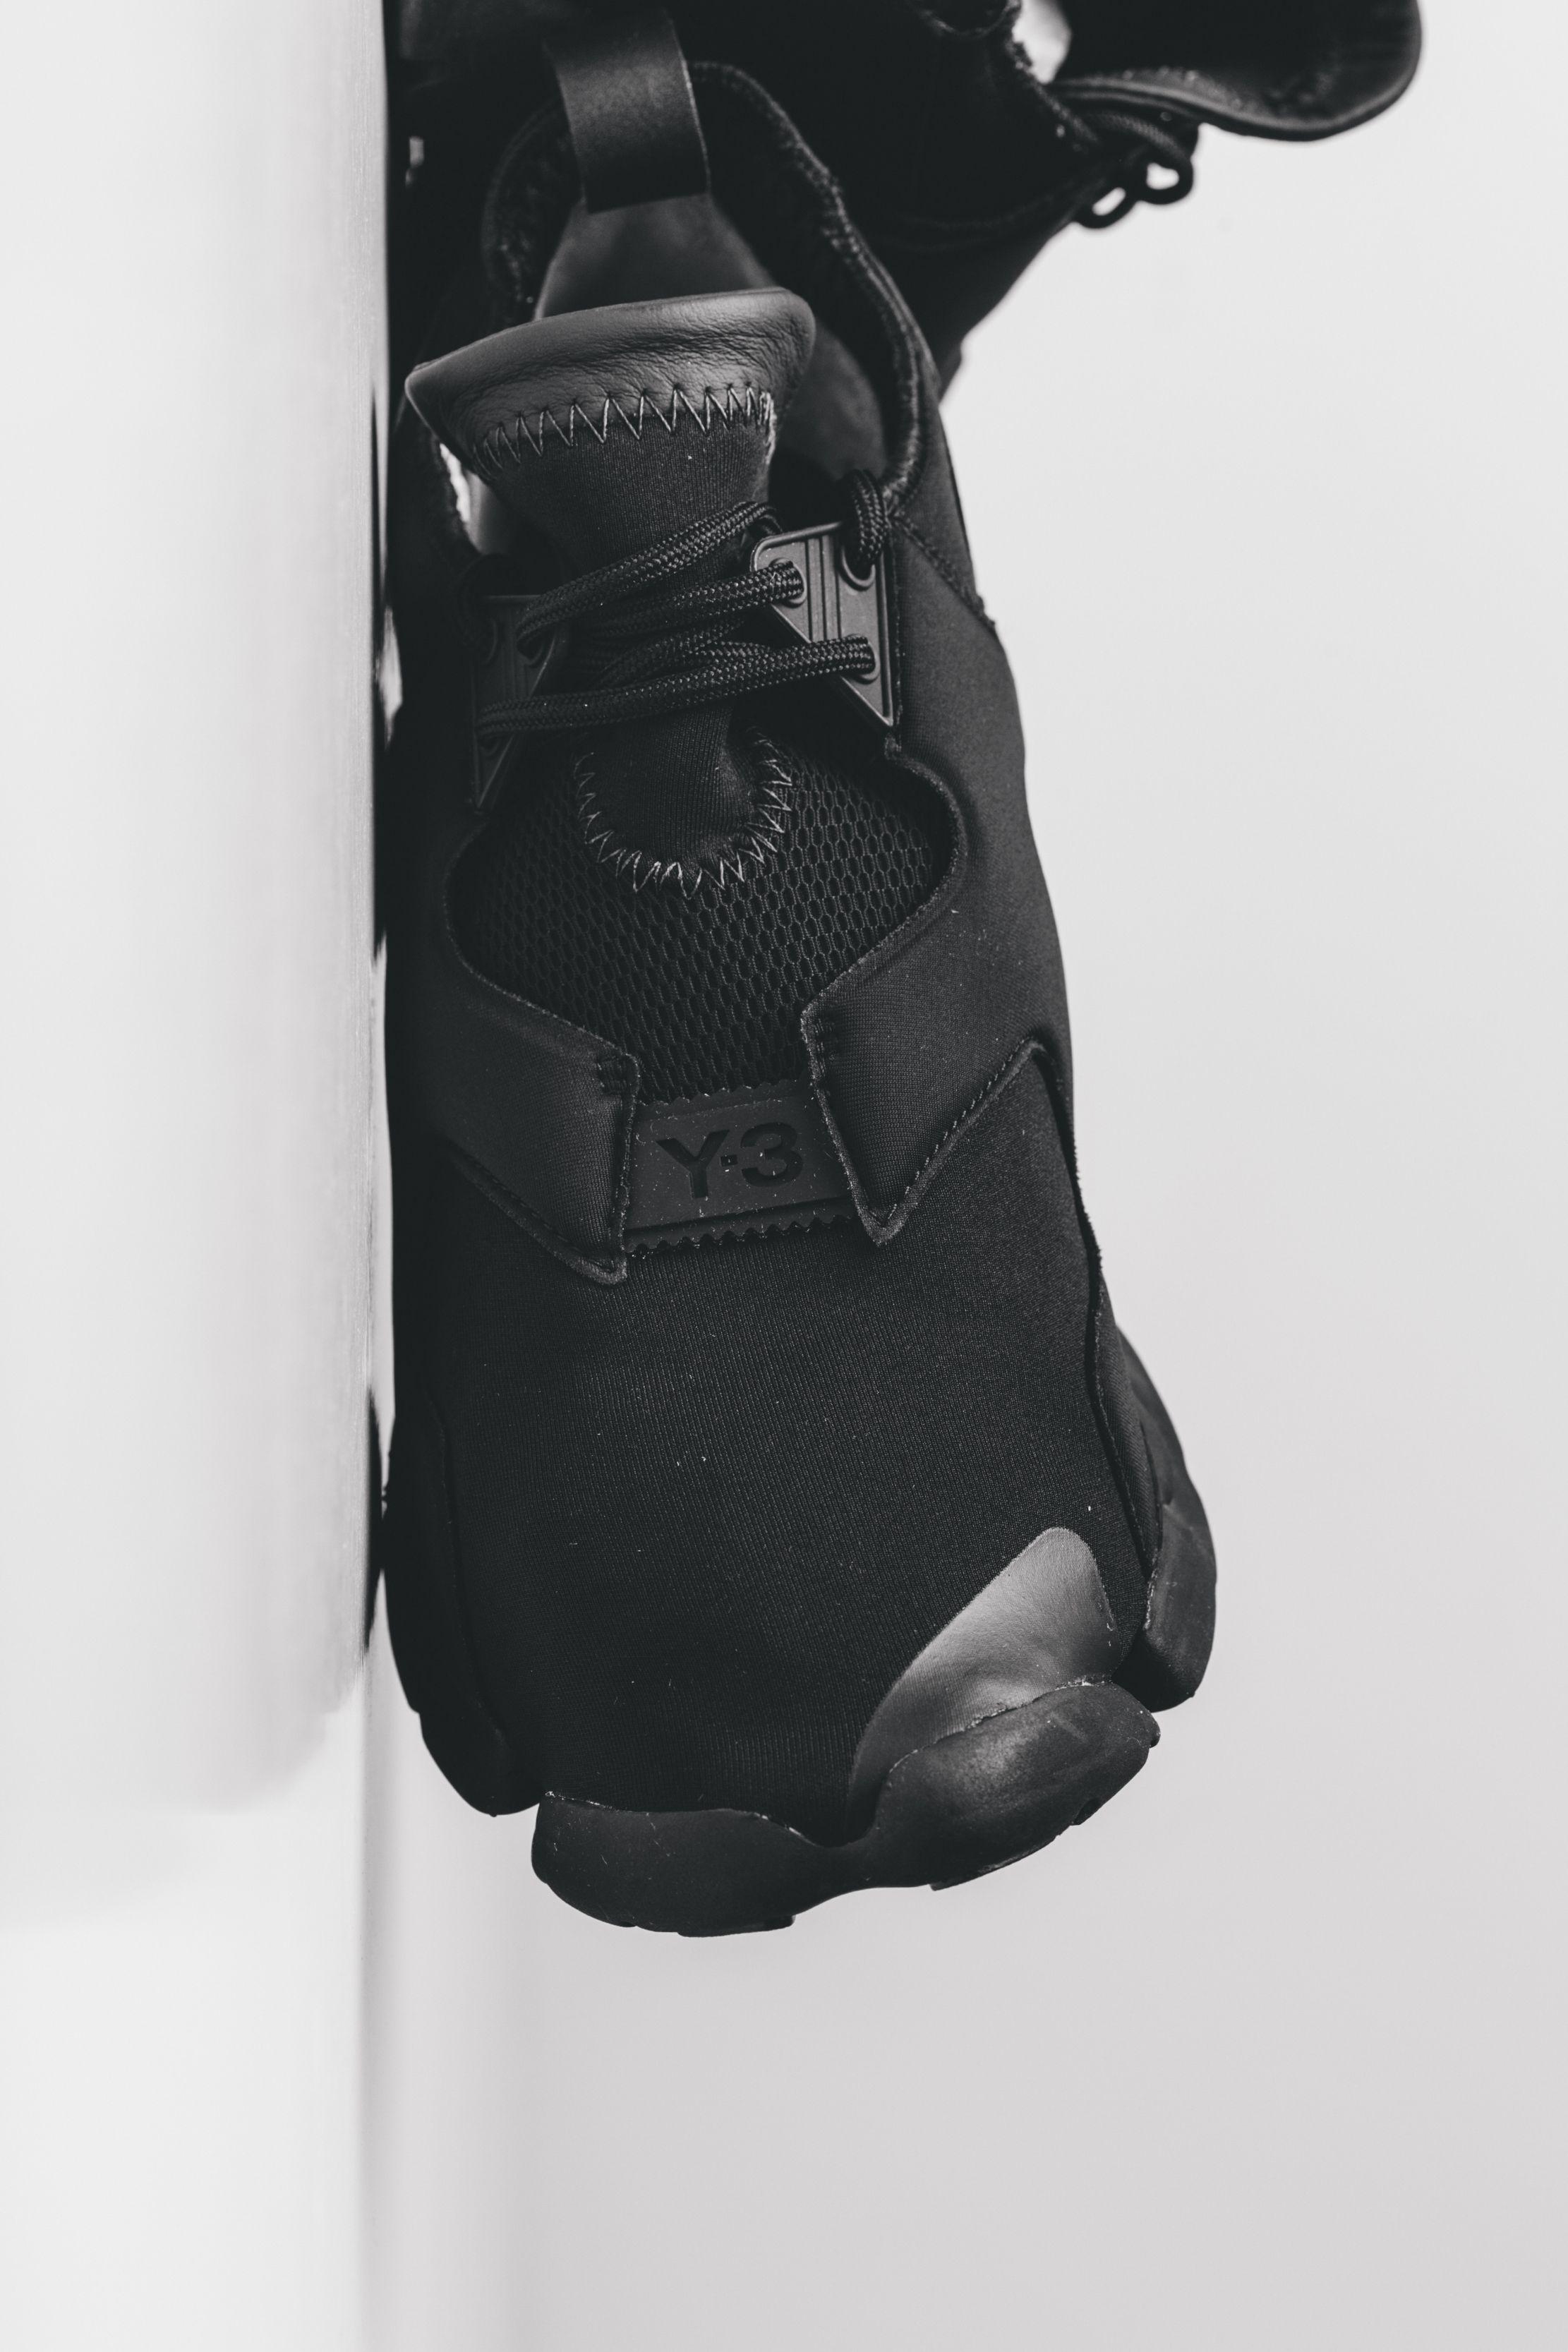 adidas shoes photography vogue fabrics inc 575134